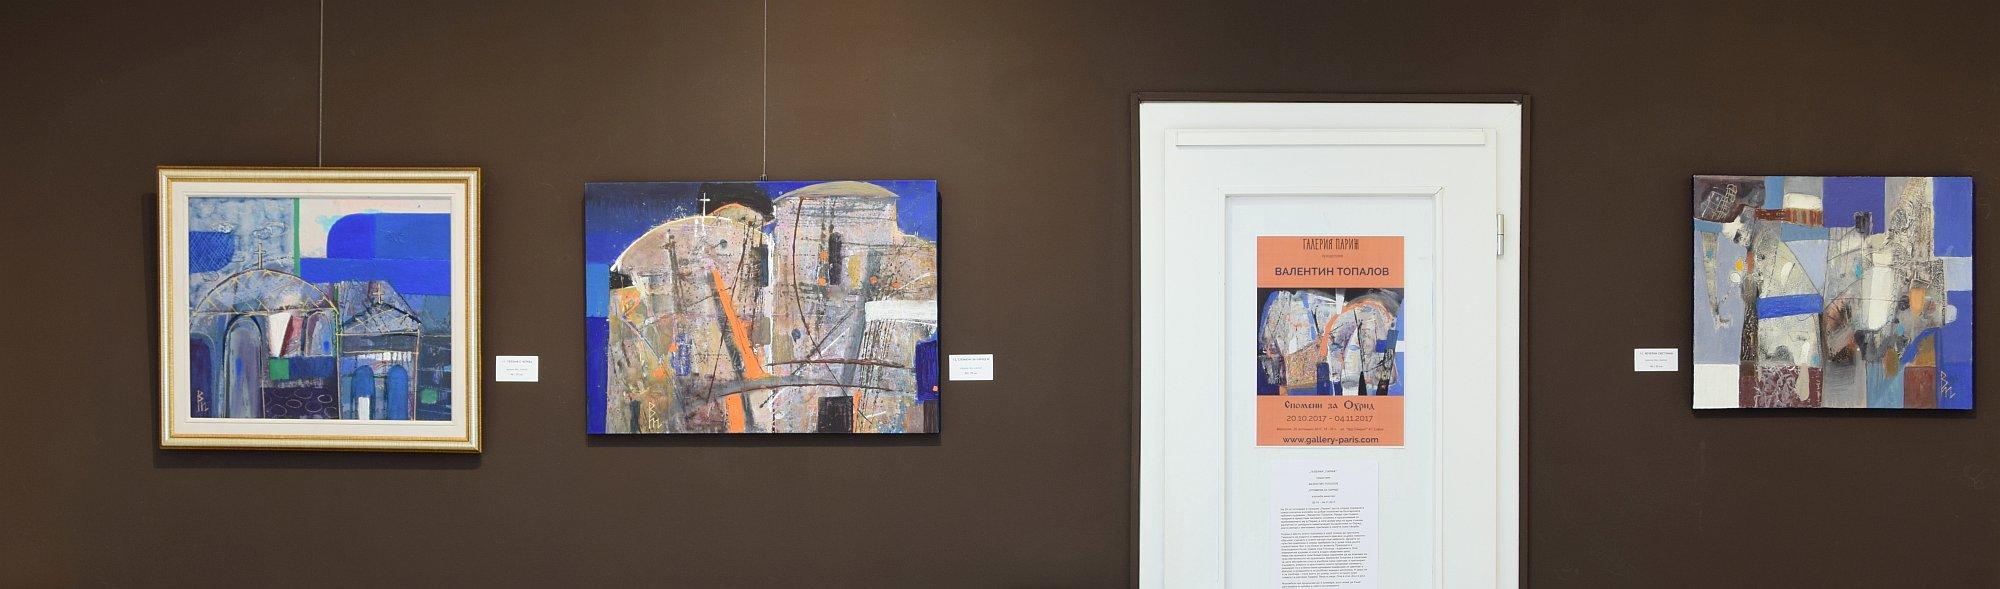 Валентин Топалов - абстрактна живопис в галерия Париж